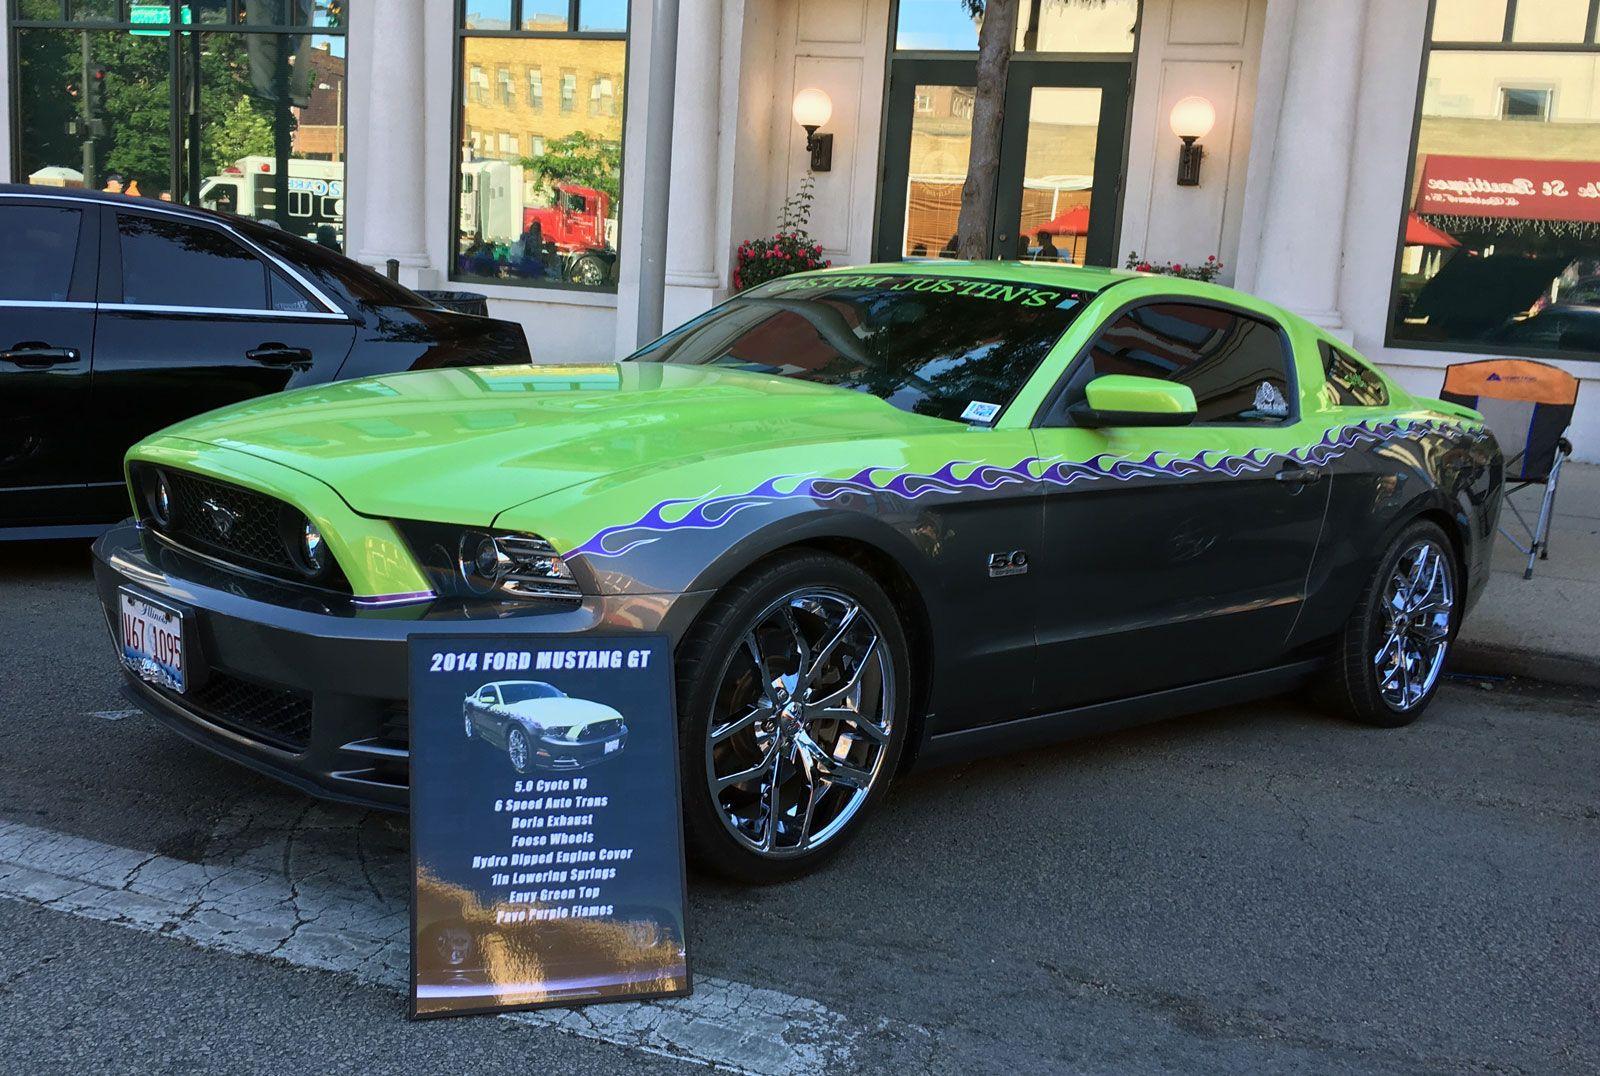 Mustang Car Show Board Car Show Signs Pinterest - Mustang car shows